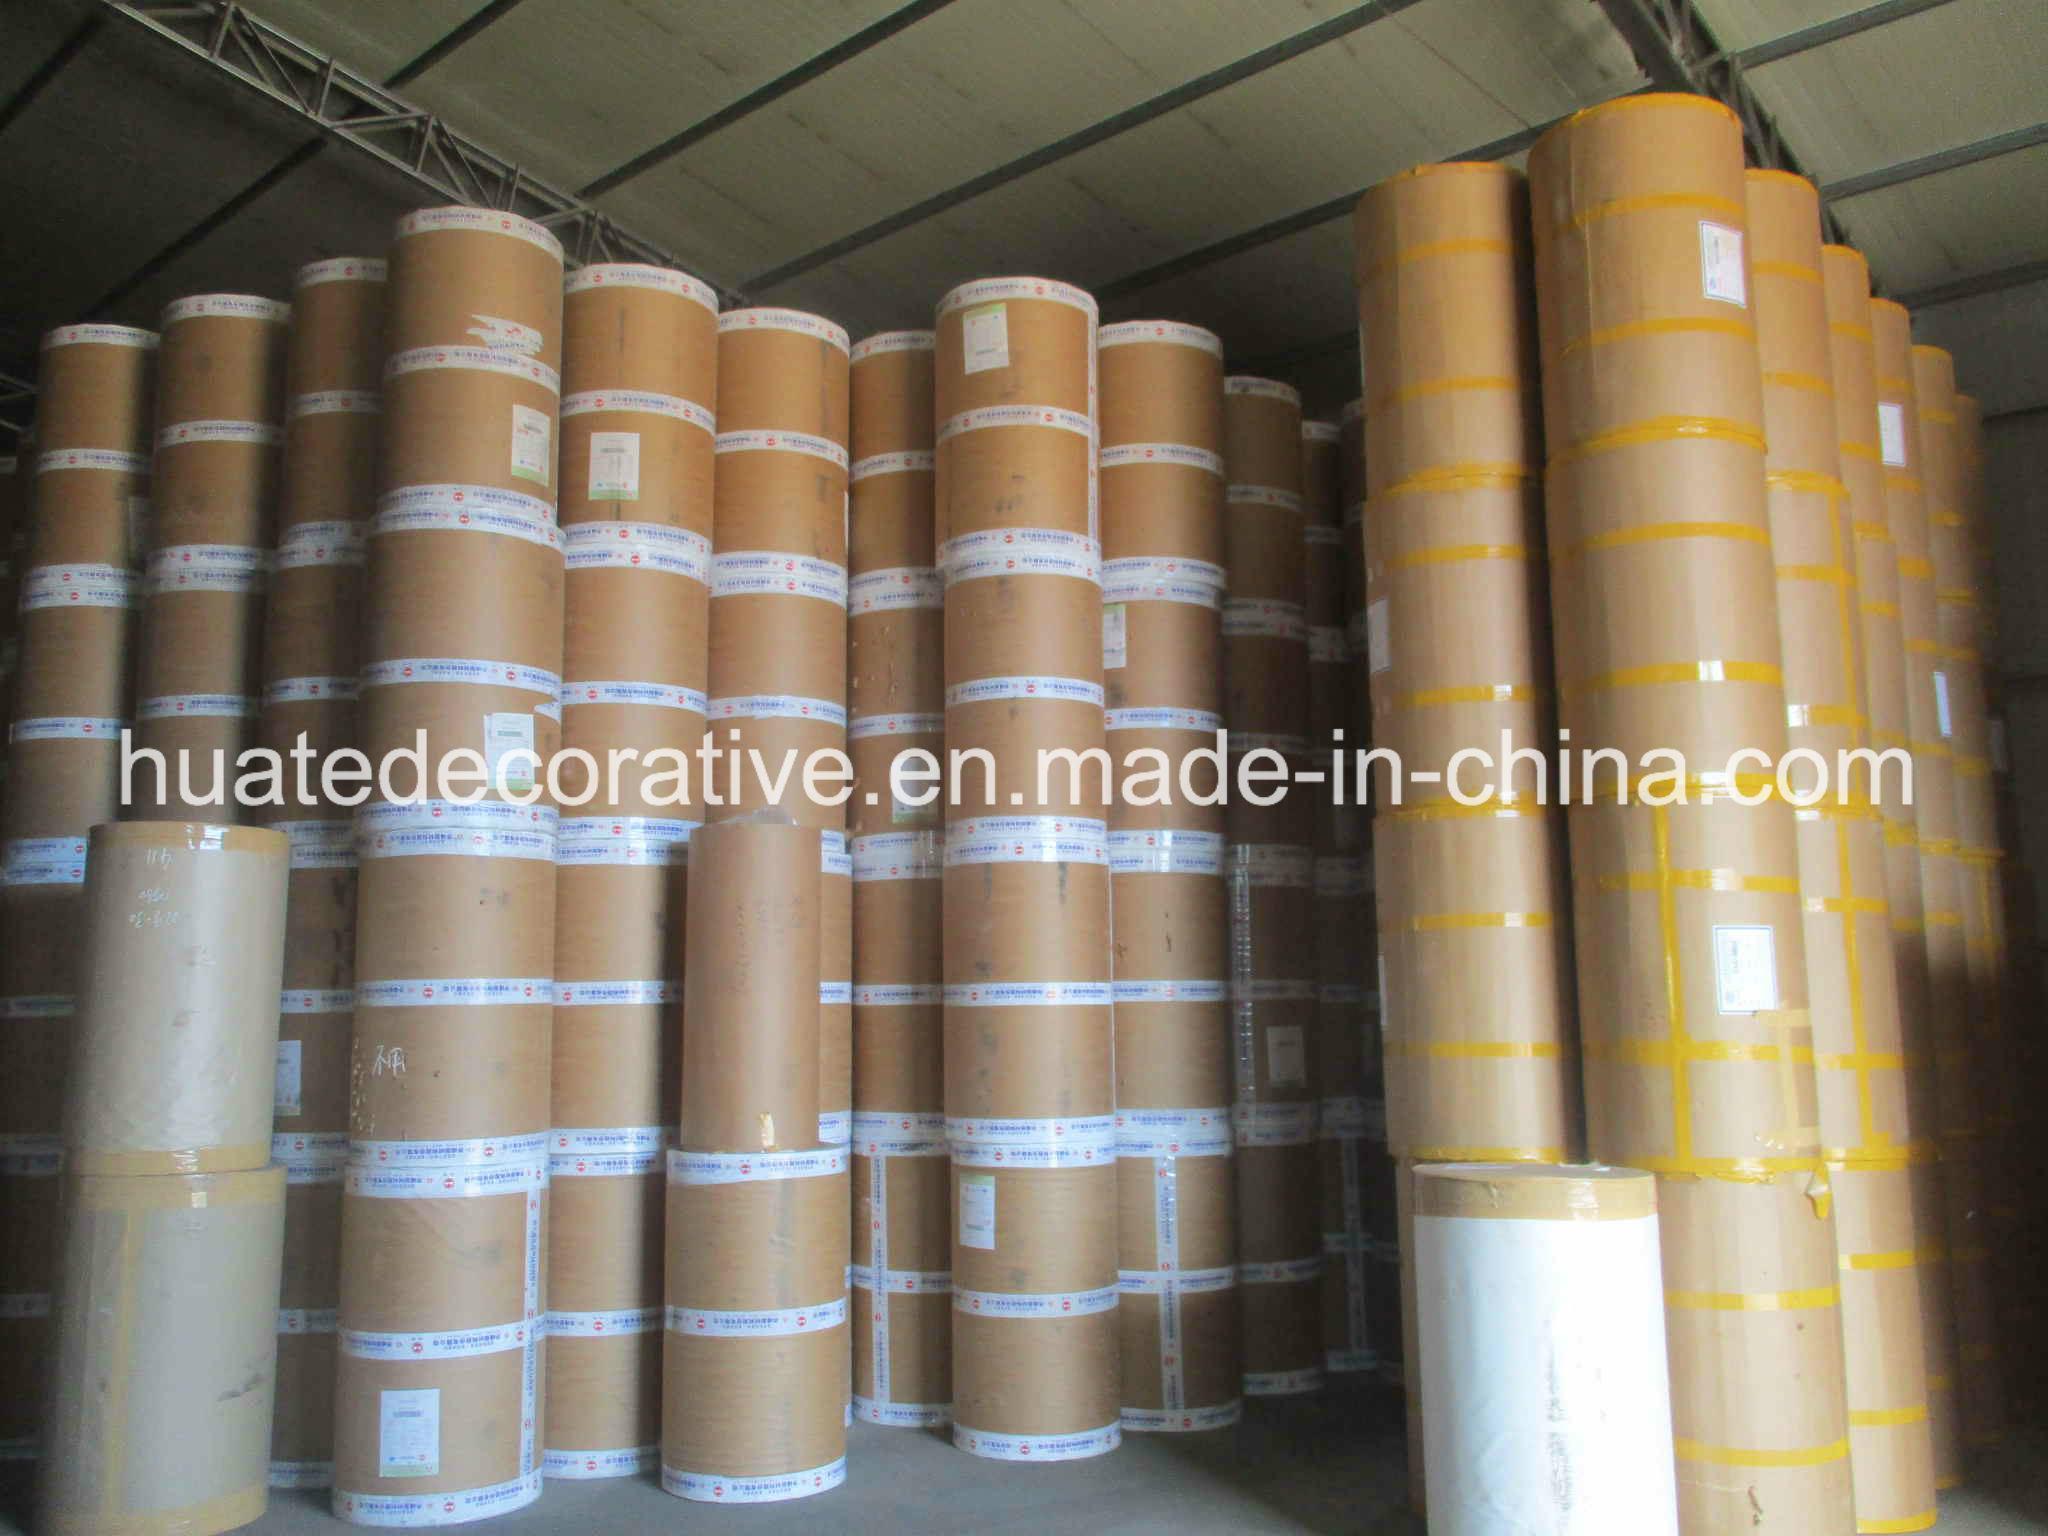 Marble Melamine Impregnated Paper for MDF, Plywood, Furniture